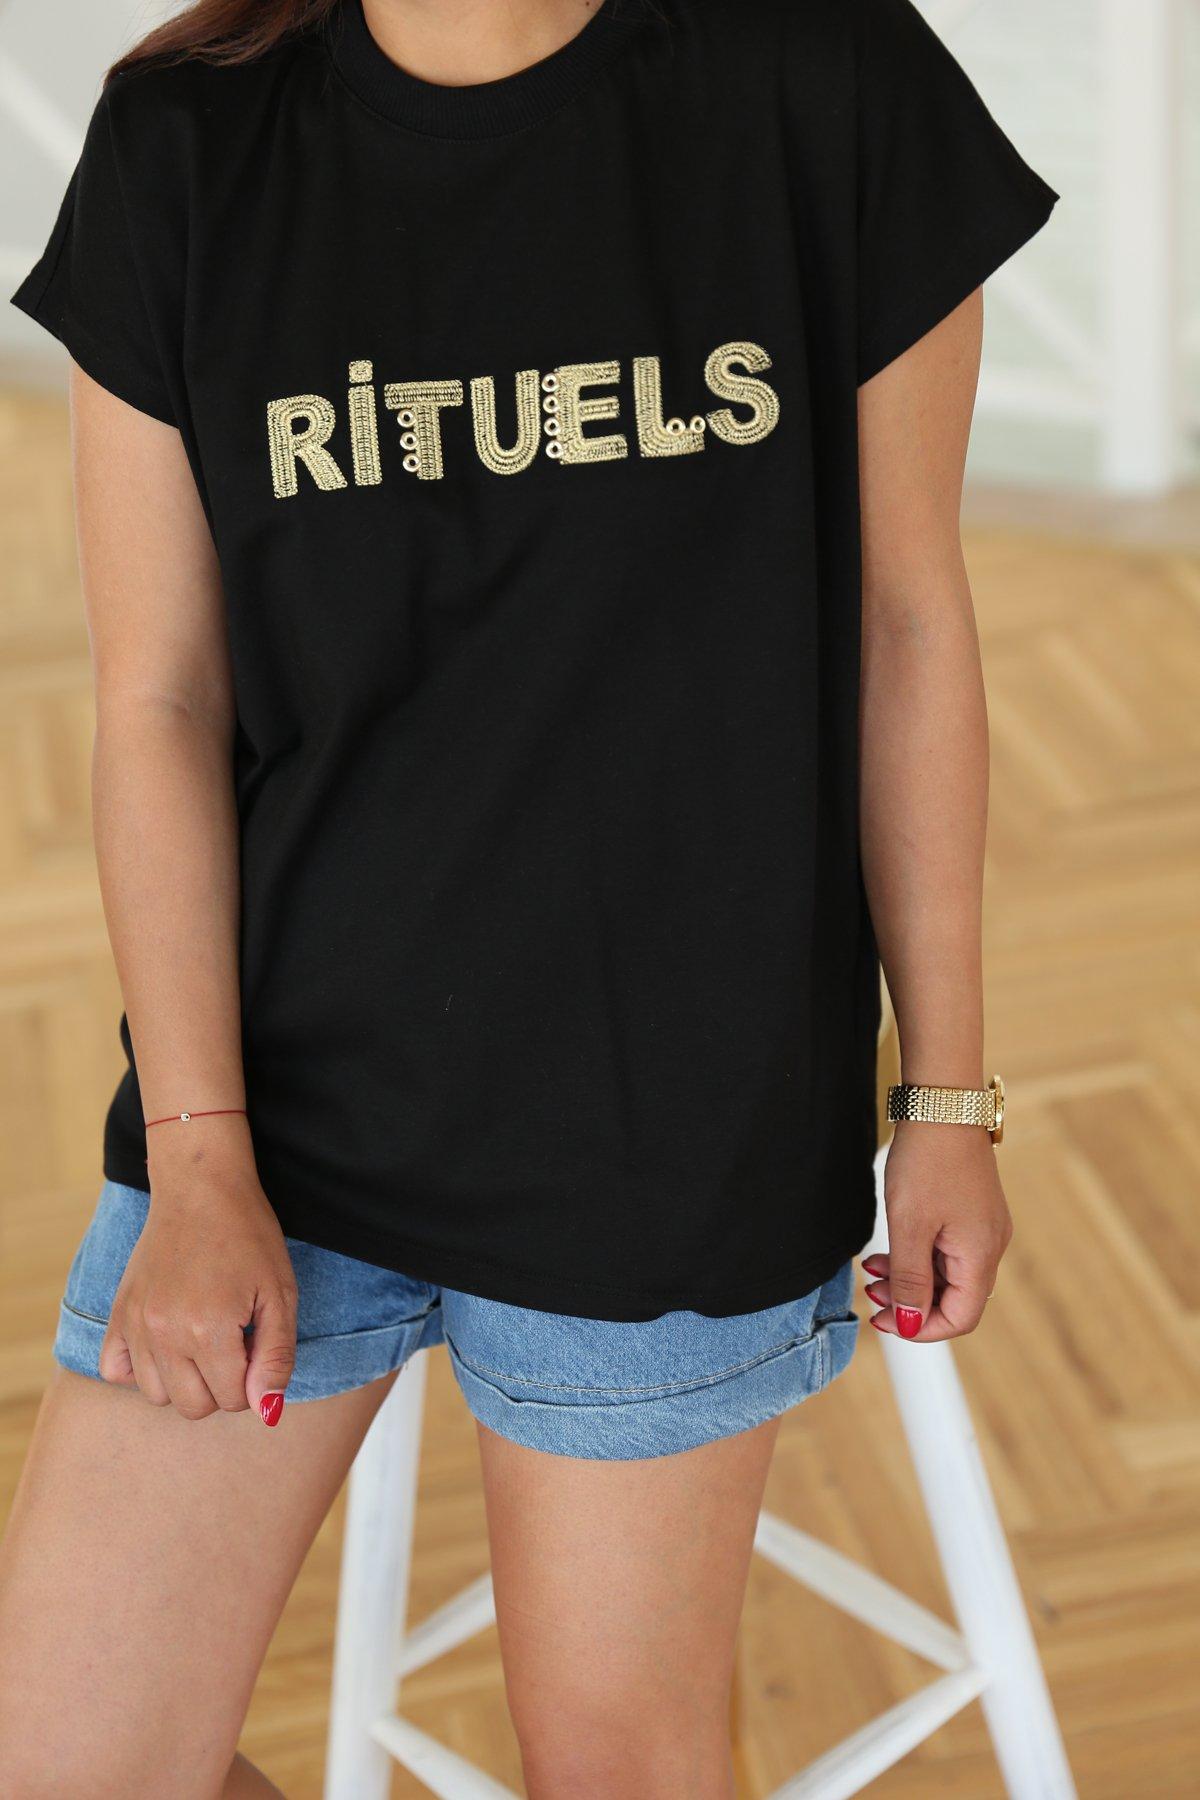 Rituels Baskılı Tshirt